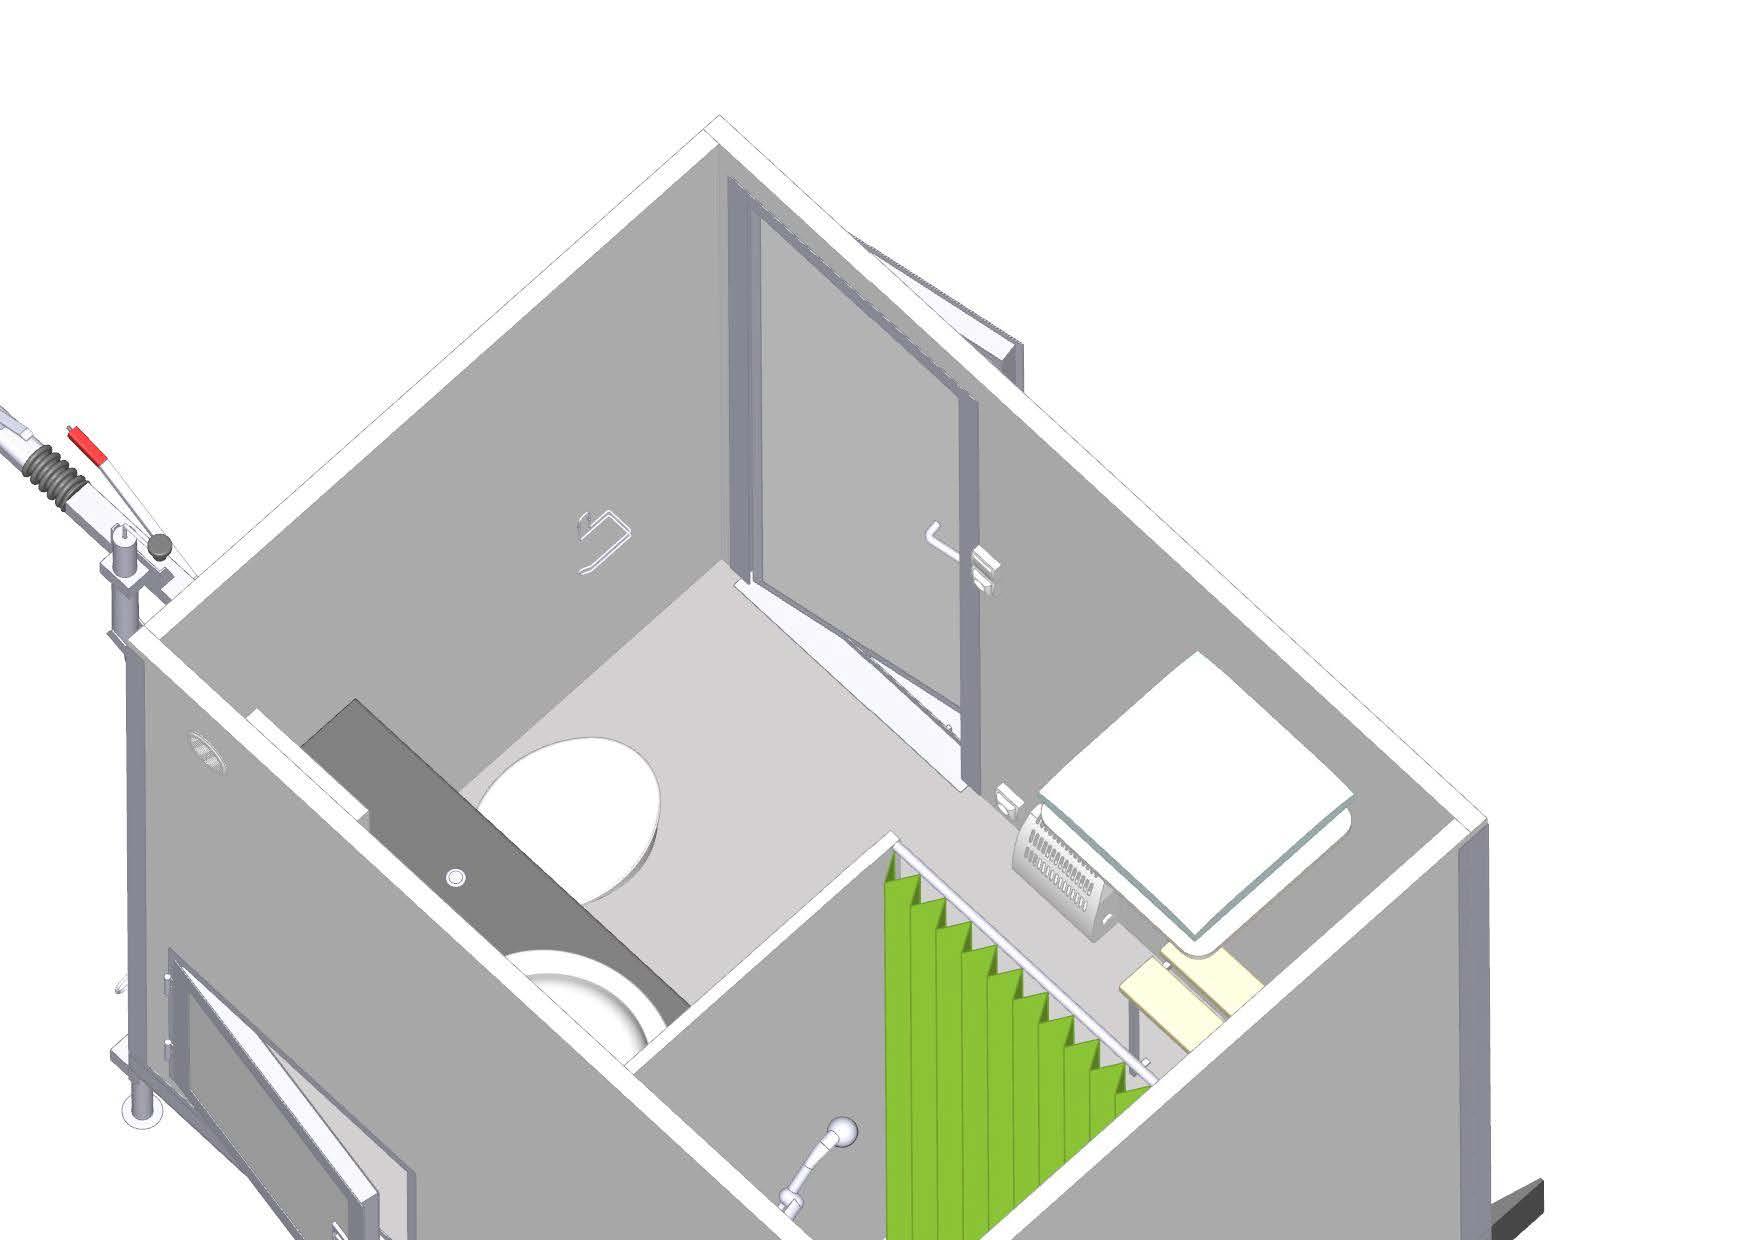 badkamer type 17 3D_Pagina_07.jpg